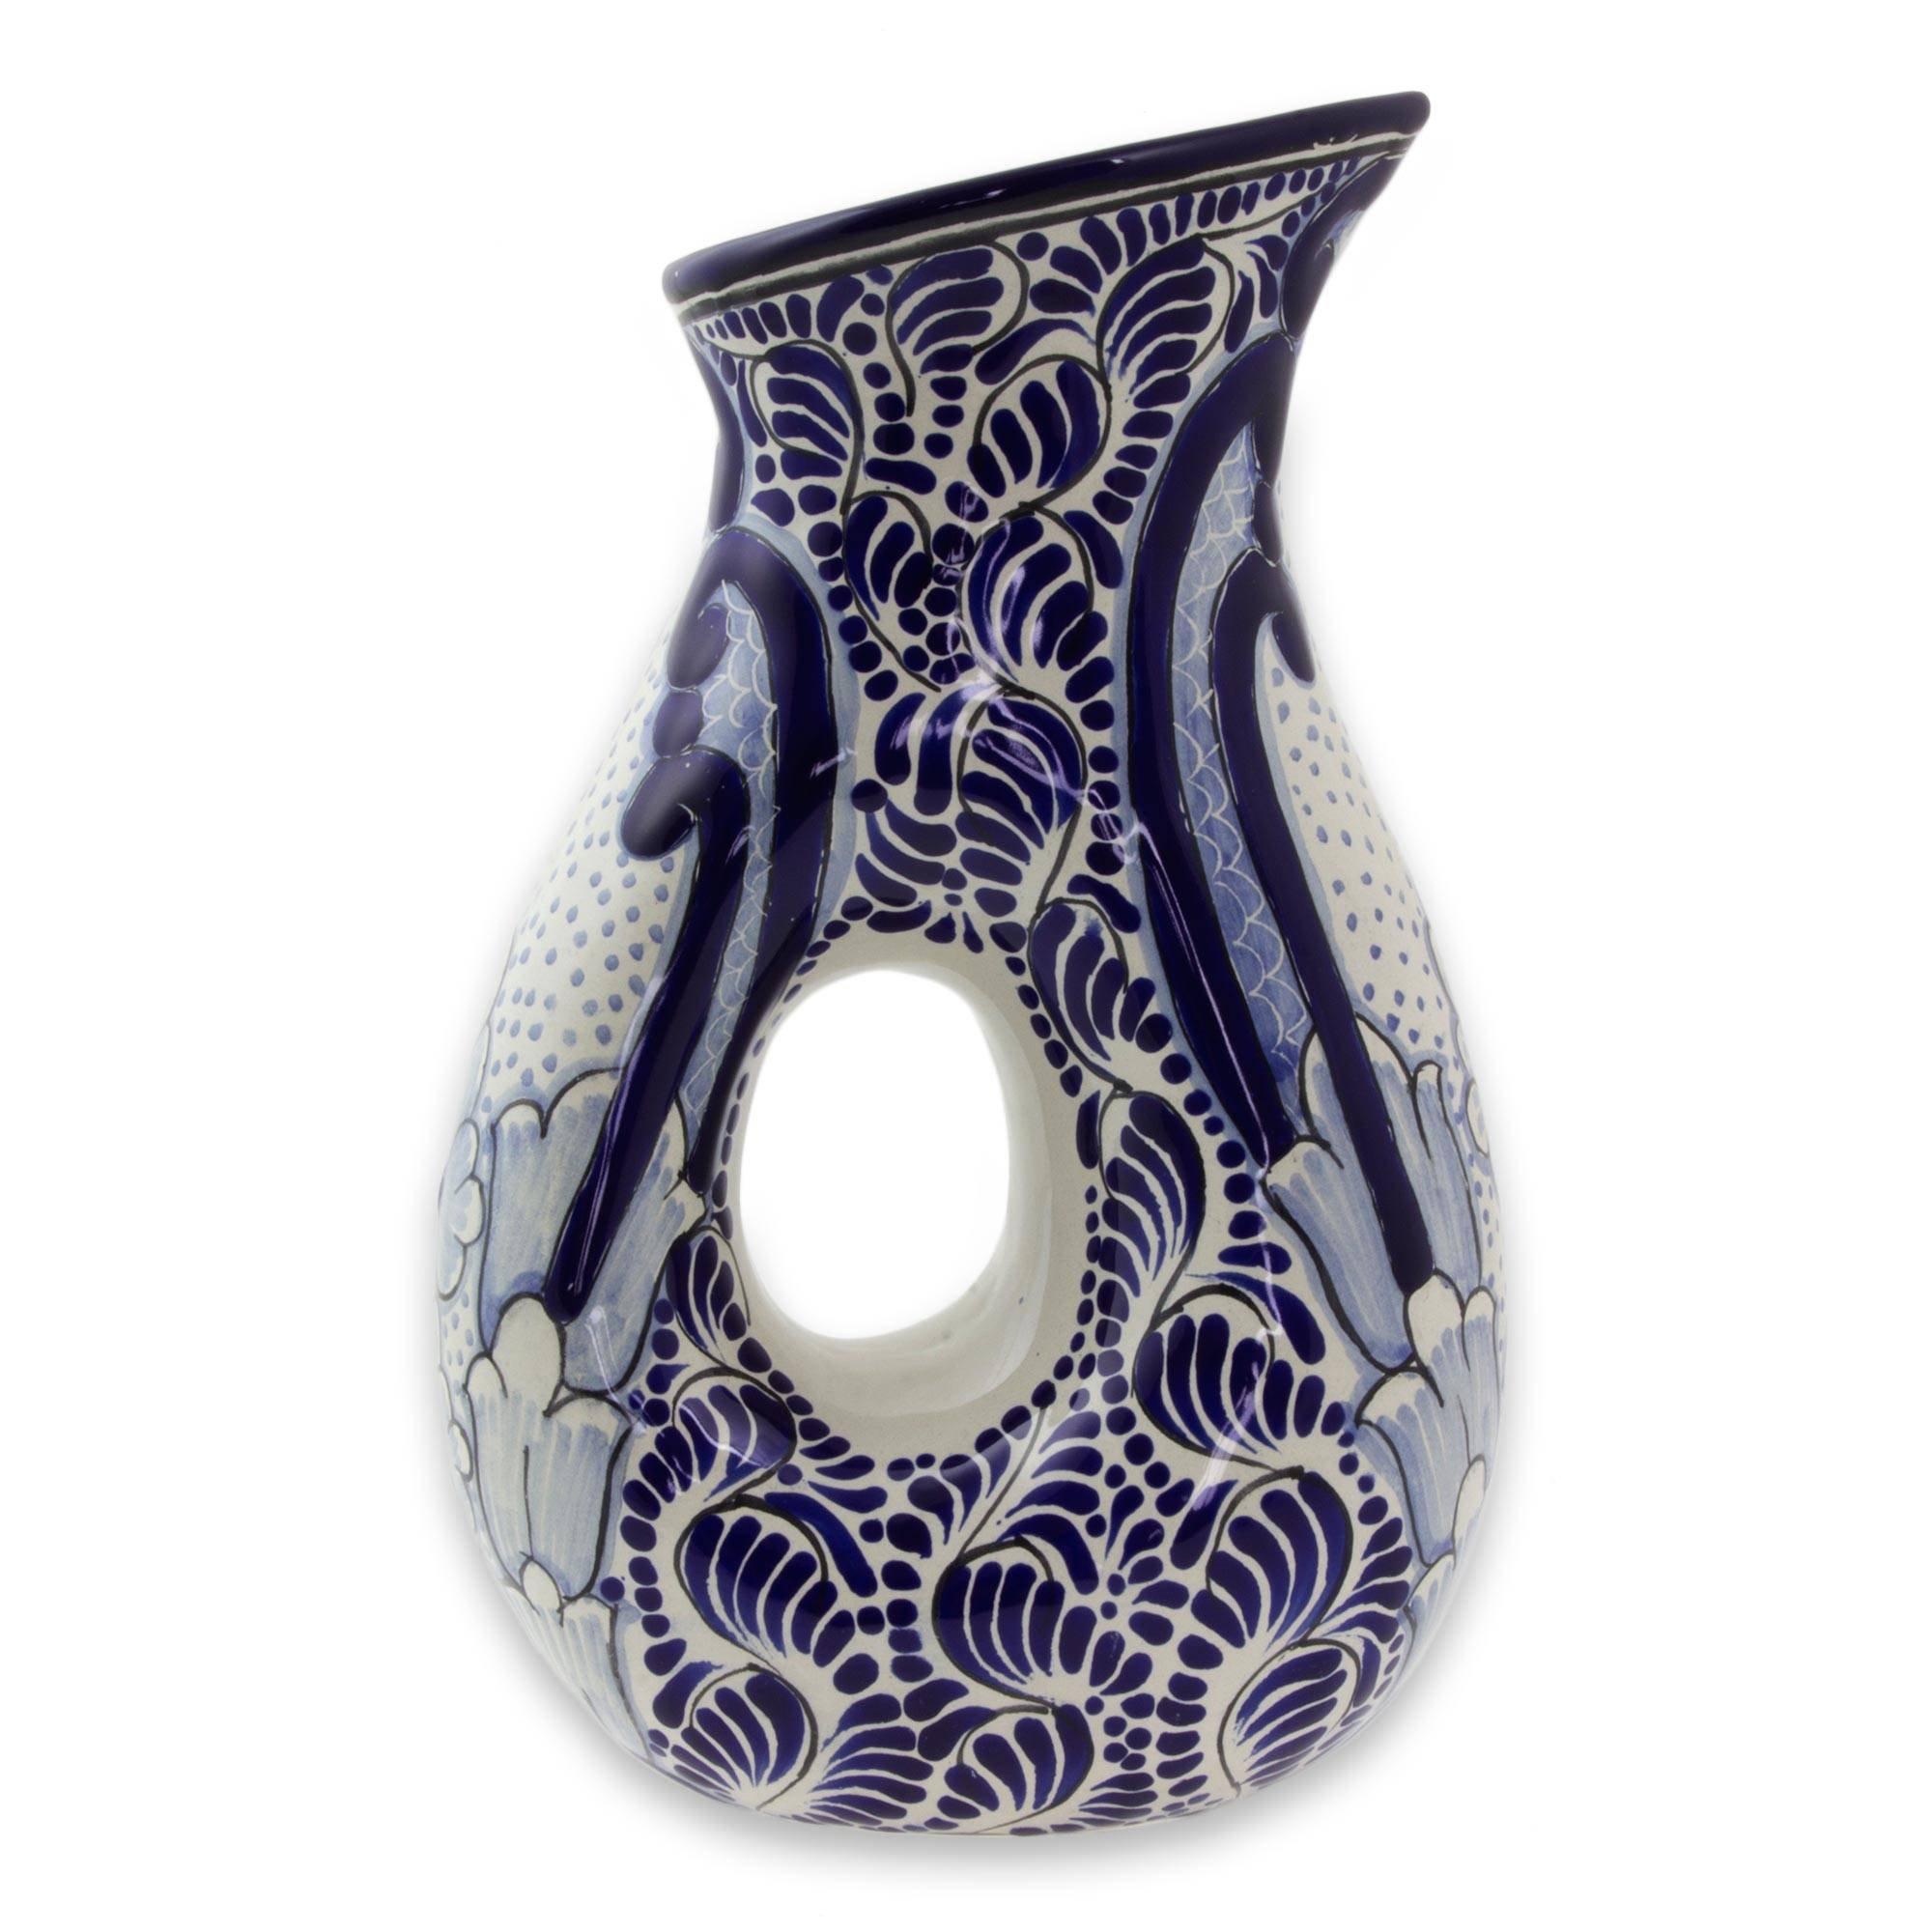 NOVICA Blue Floral Ceramic Pitcher, 47 oz, 'Puebla Kaleidoscope' by NOVICA